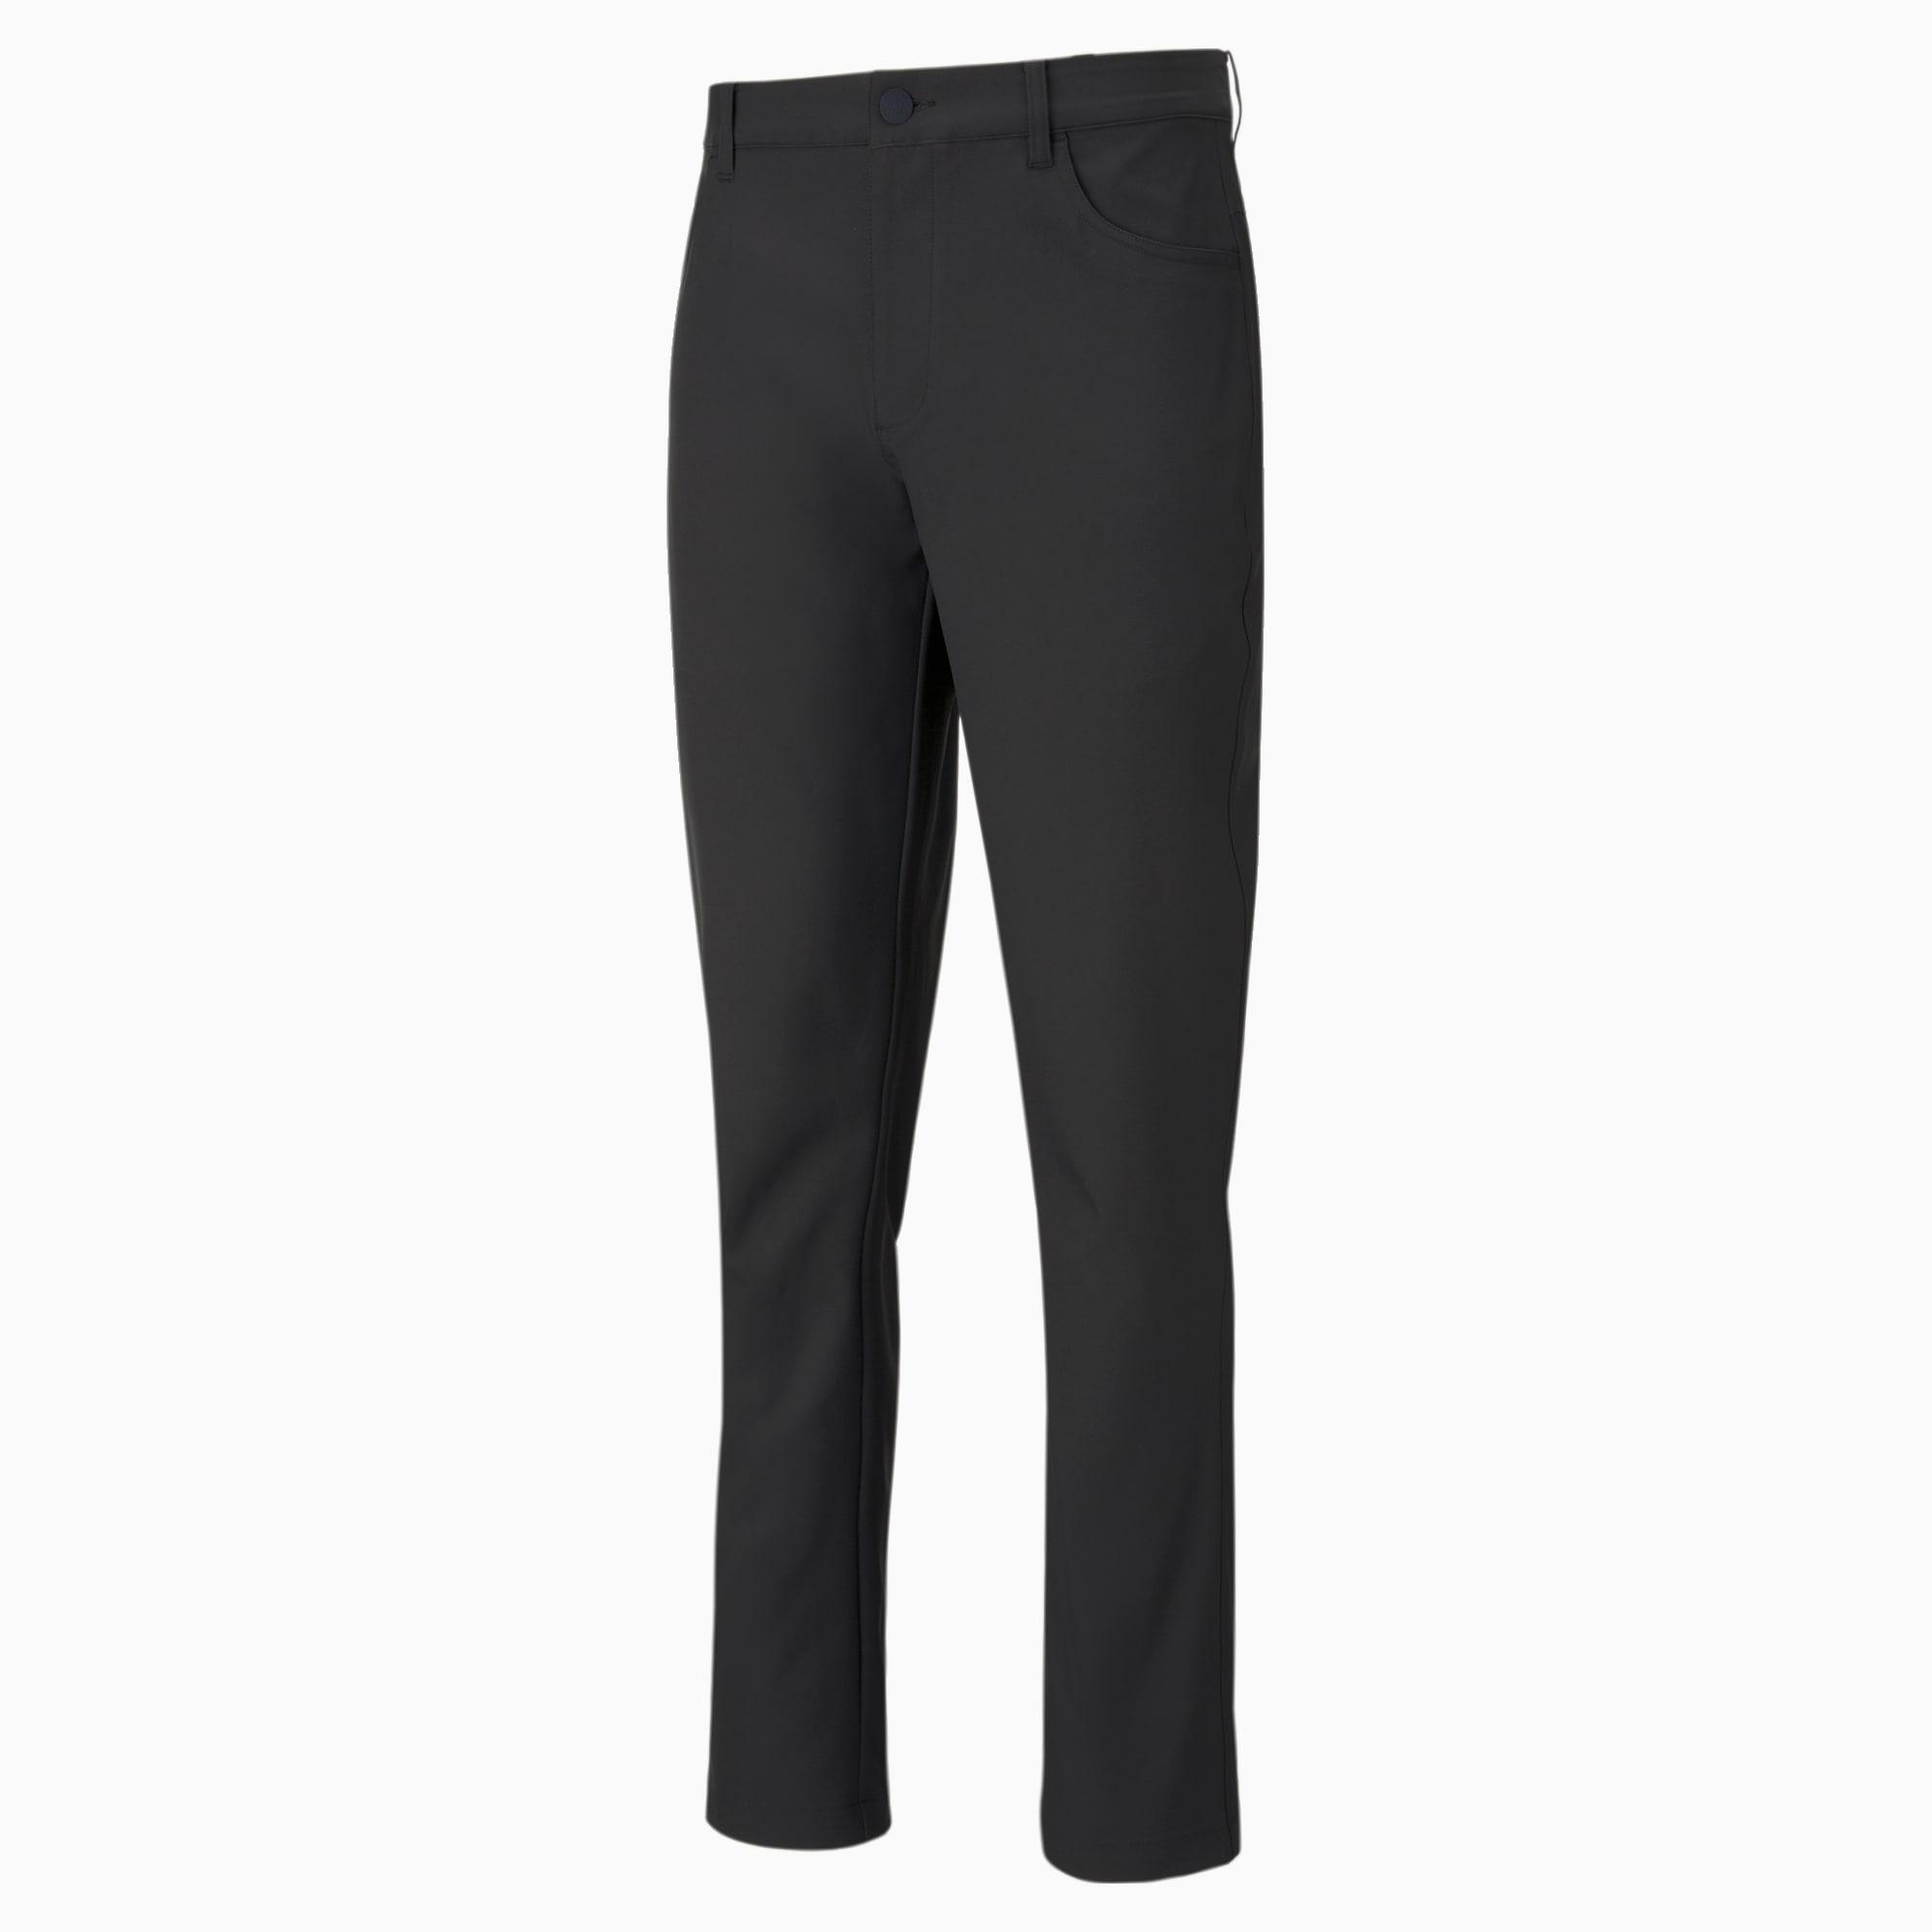 Jackpot 5-pocket golfbroek heren, Zwart, Maat 36/30 | PUMA